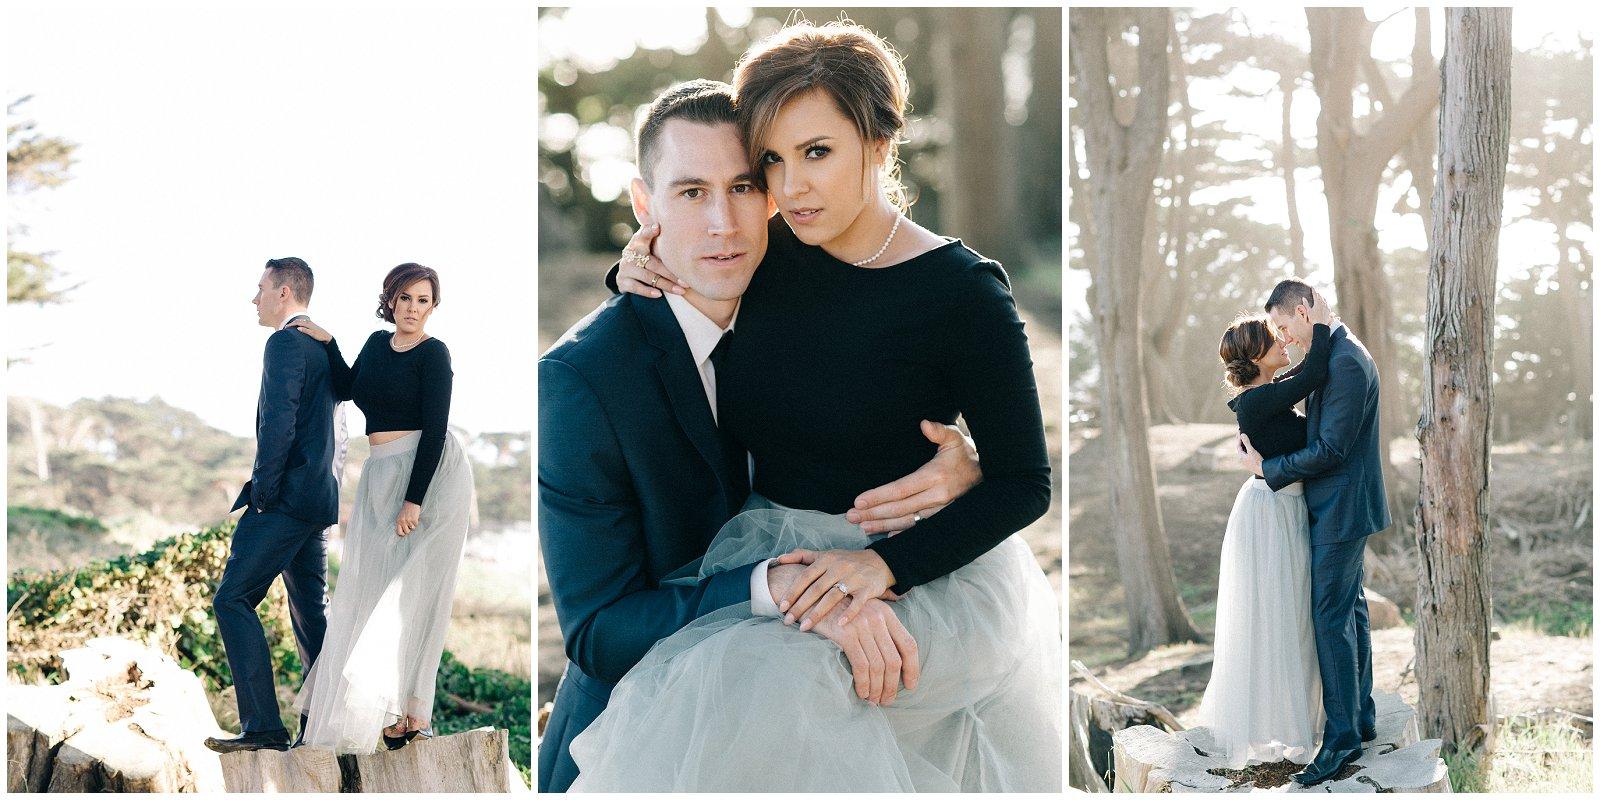 San-Francisco-Bay-Area-Wedding-Photography-Engagment-Session-6.jpg